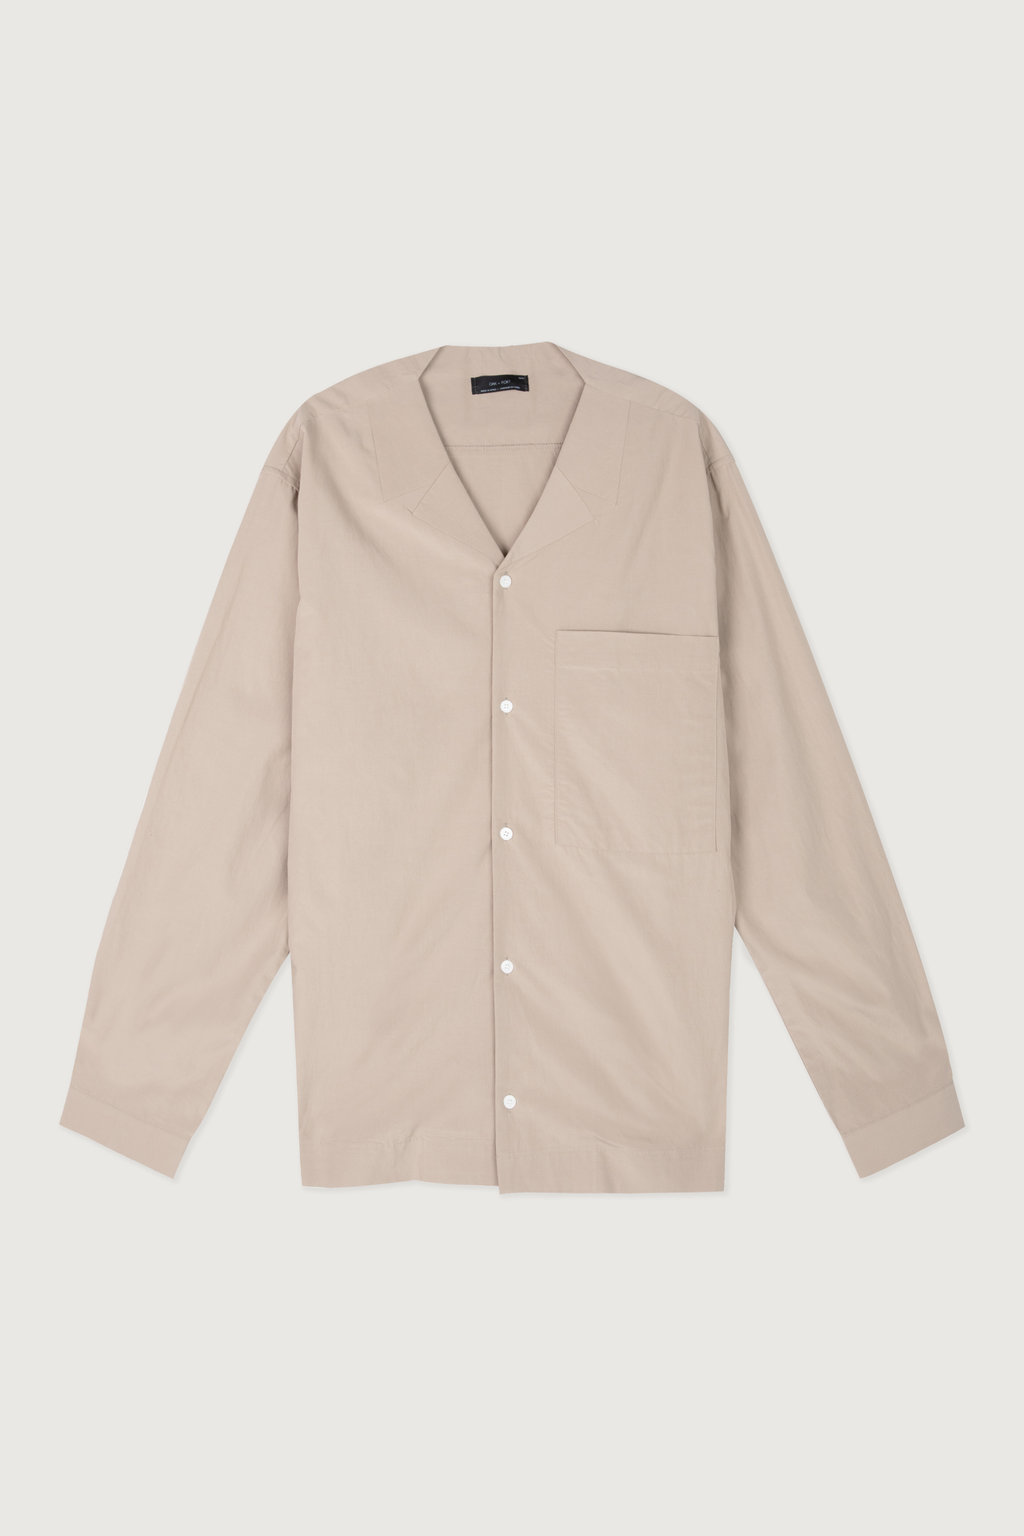 Shirt K008 Beige 1